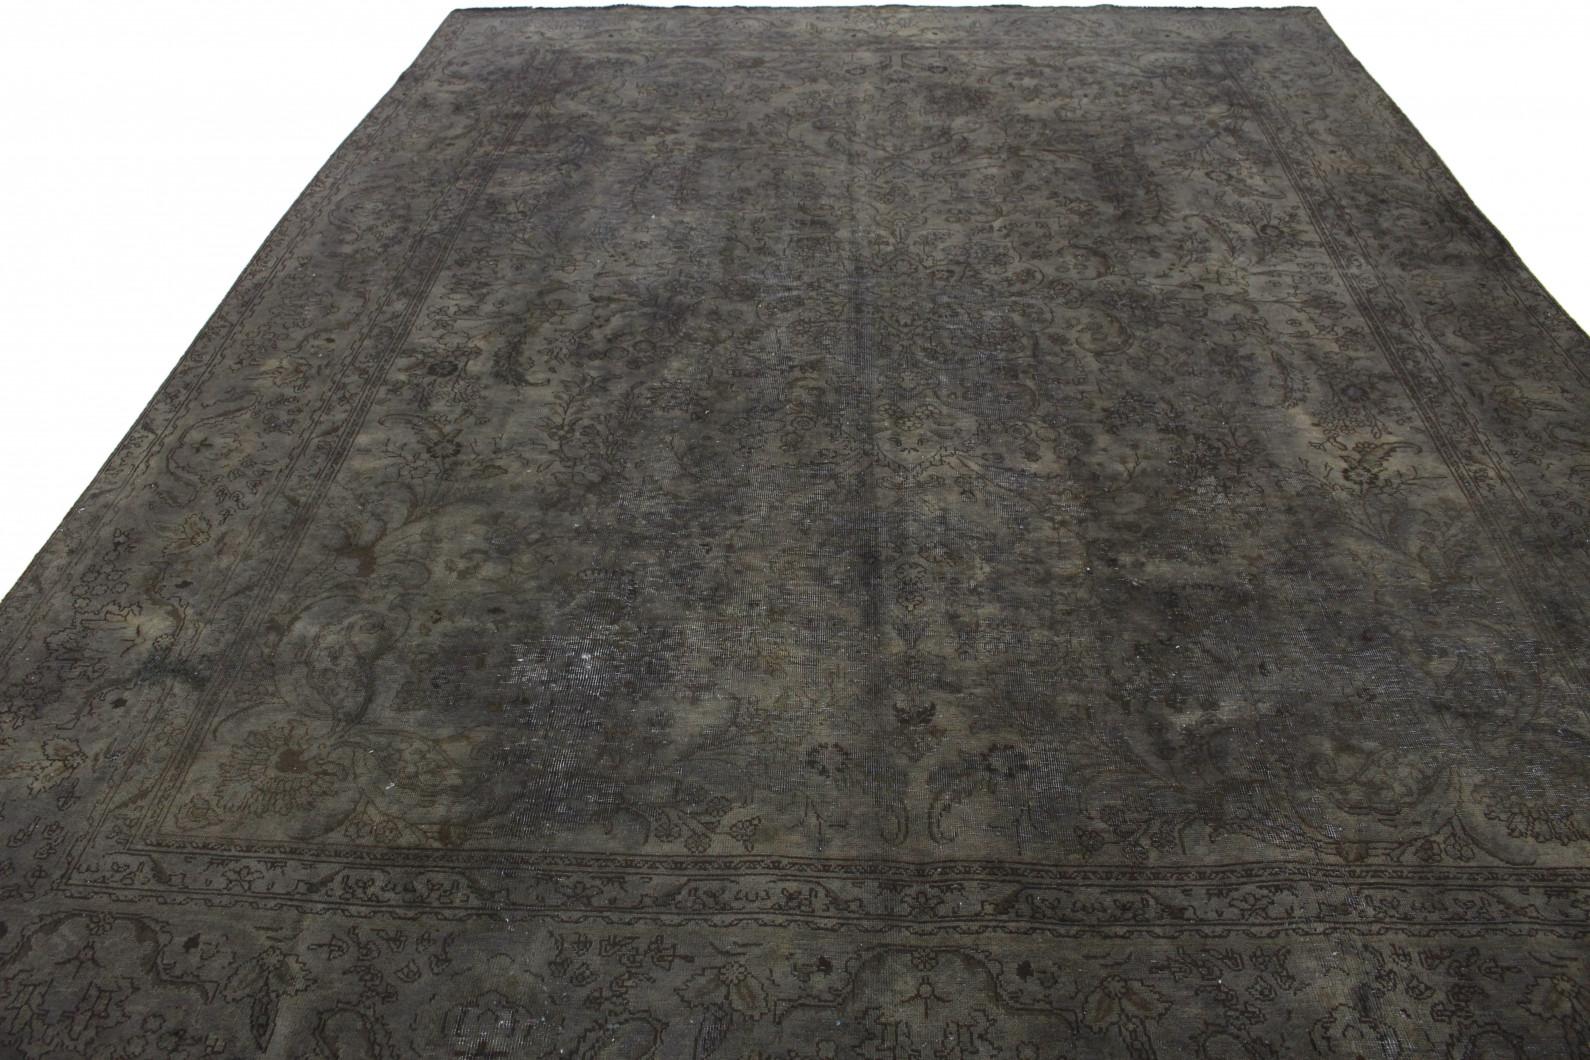 teppiche schwarz grau kuhfell teppich grau schwarz wei x cm with teppiche schwarz grau finest. Black Bedroom Furniture Sets. Home Design Ideas